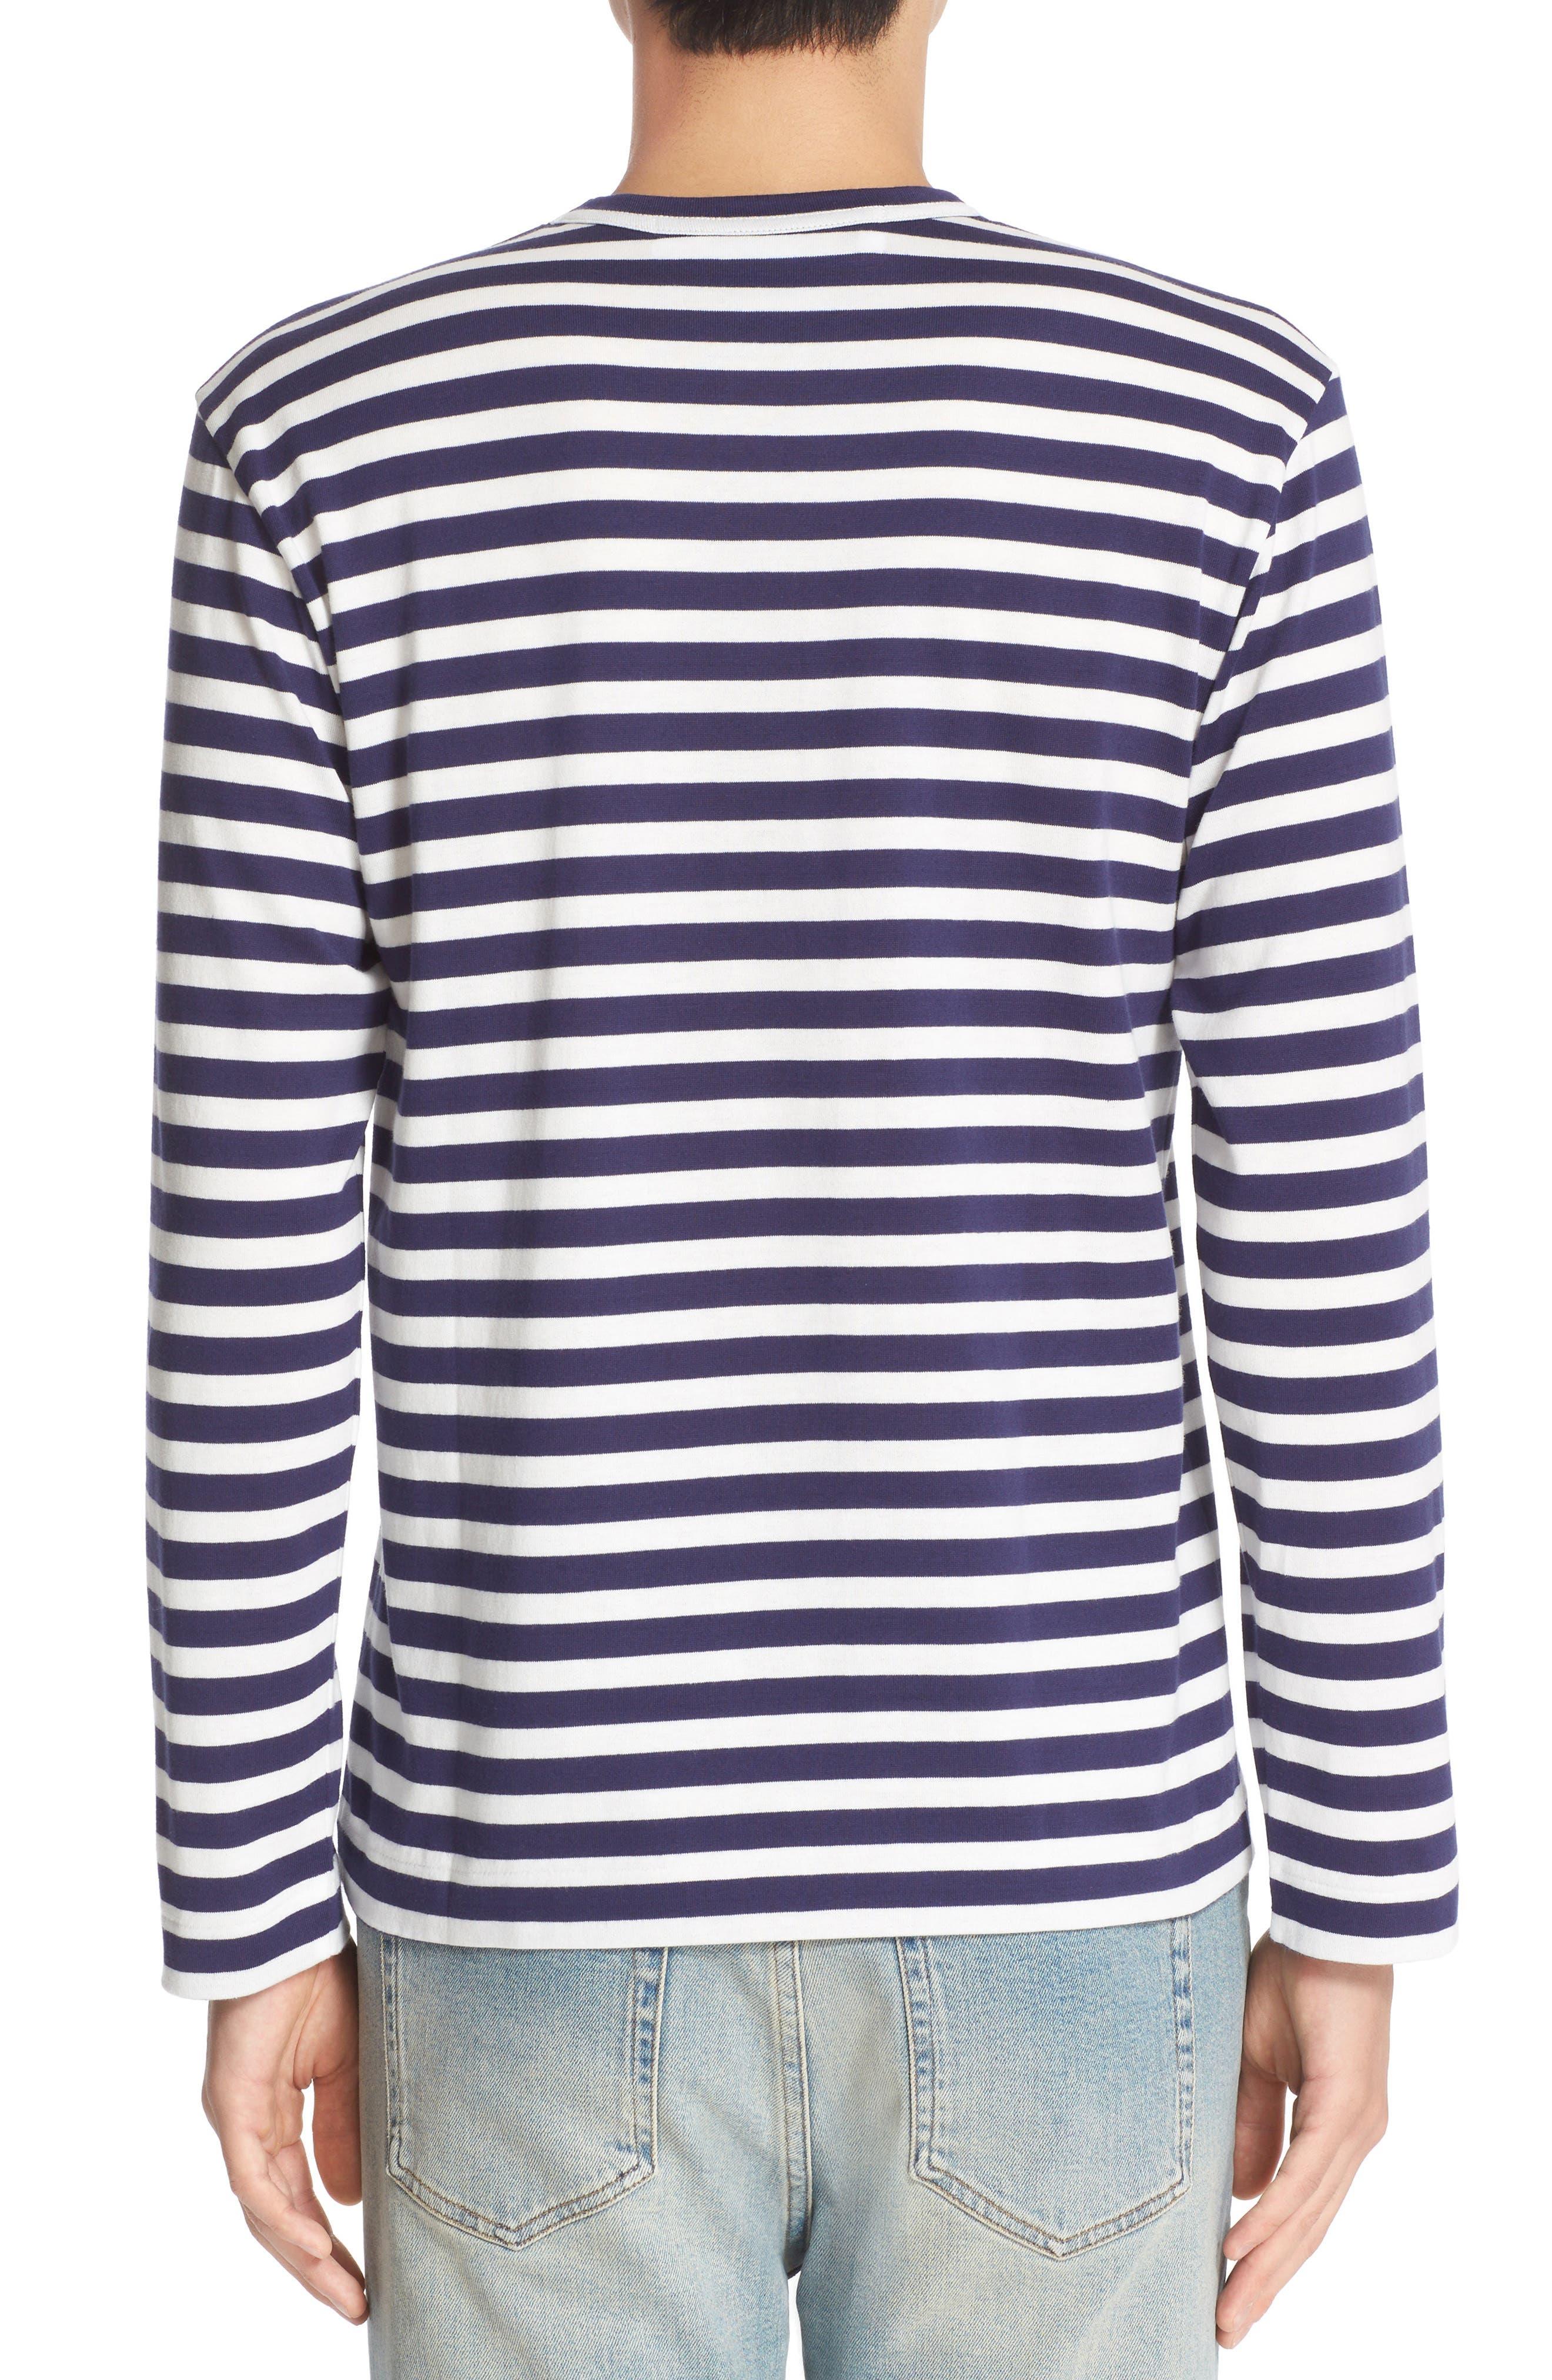 Twin Appliqué Stripe T-Shirt,                             Alternate thumbnail 2, color,                             NAVY/ WHITE